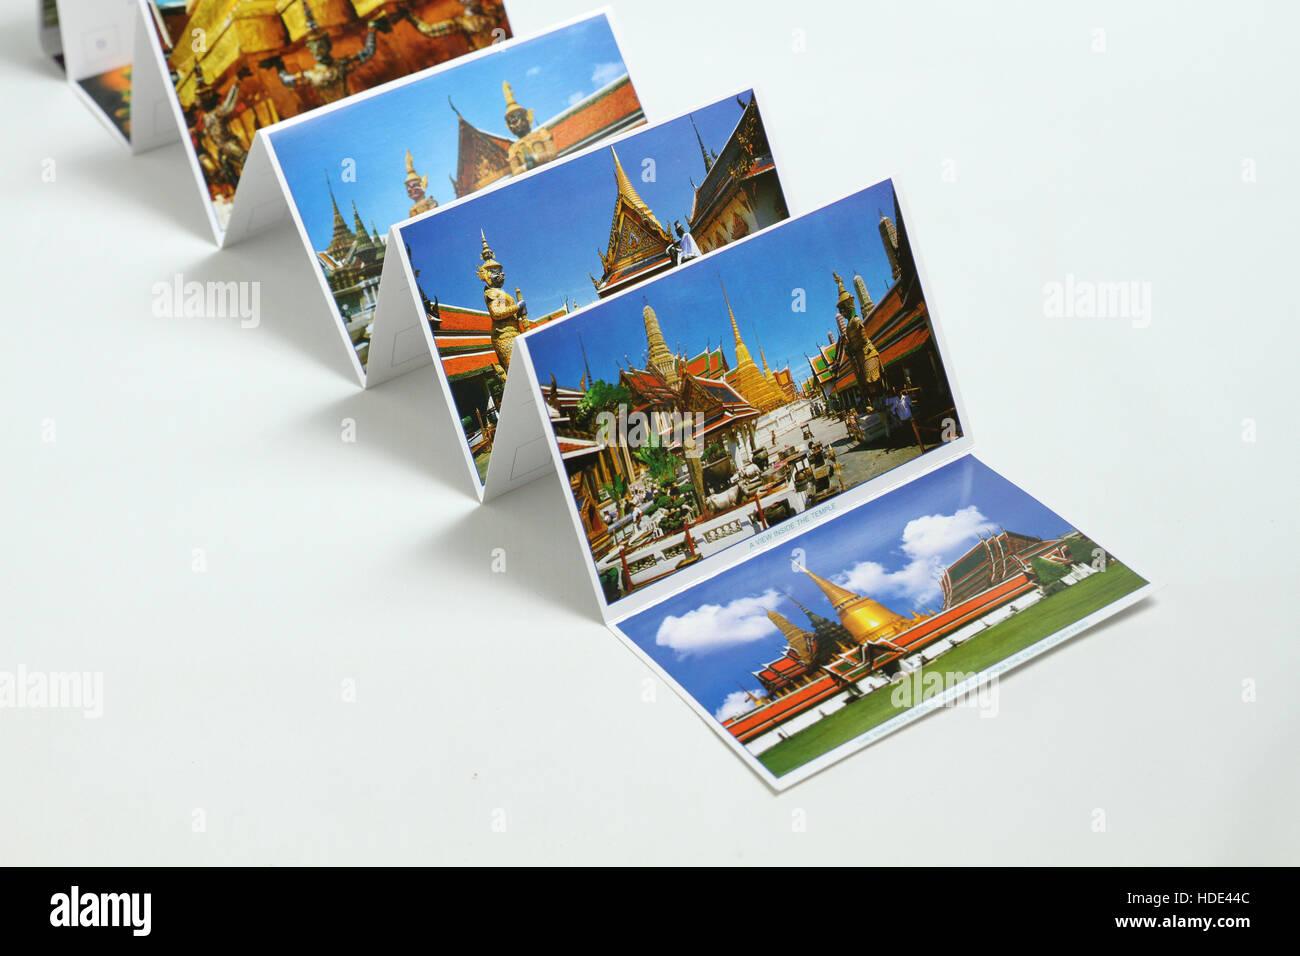 bangkok postcards - Stock Image